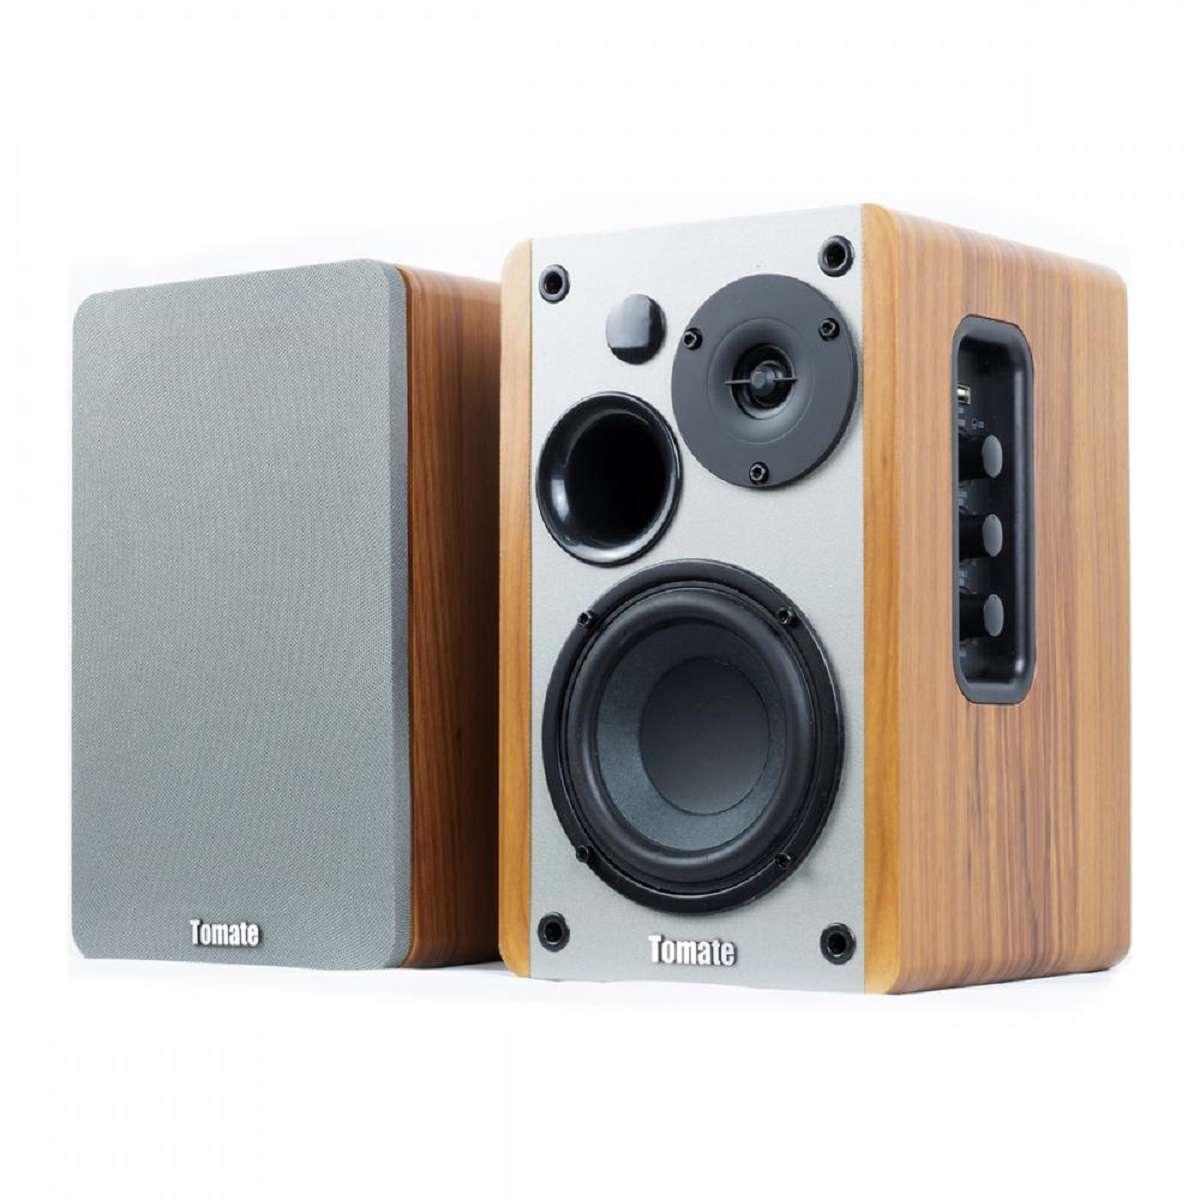 Caixa De Som Ativa Monitor Bluetooth Cabo Óptico Tomate Mts 2026